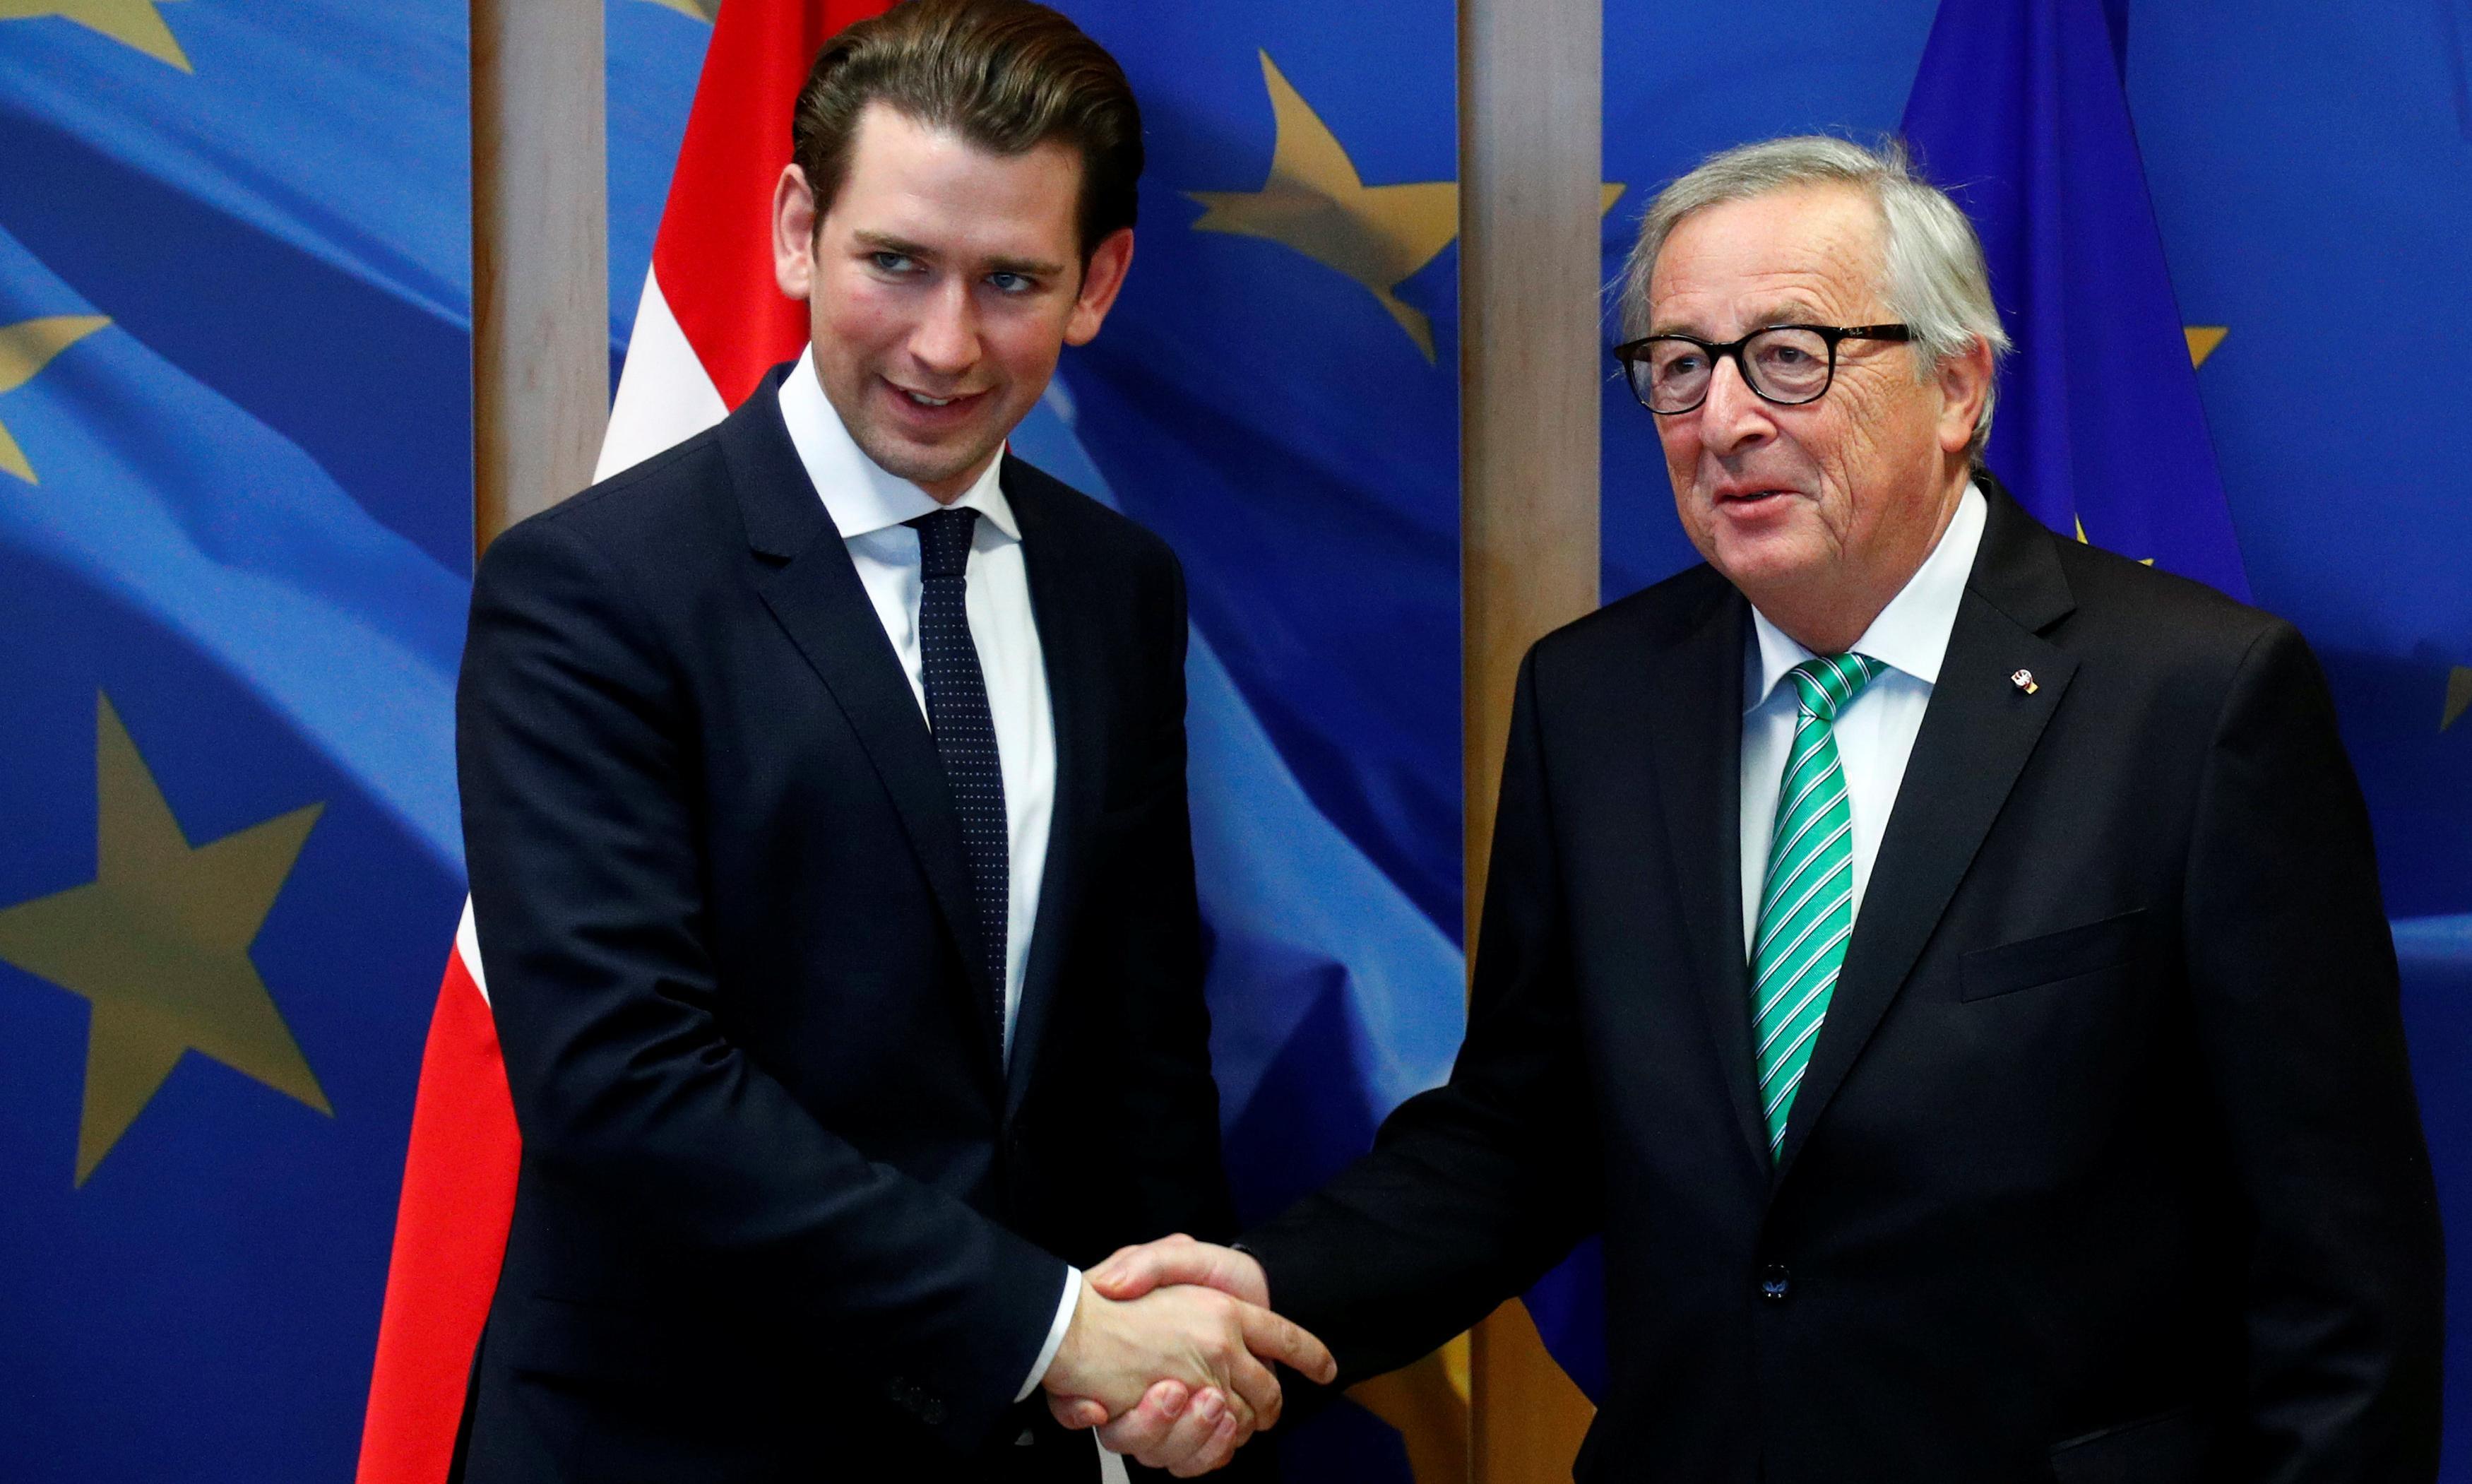 Brexit deal: take it or leave it, EU tells Britain